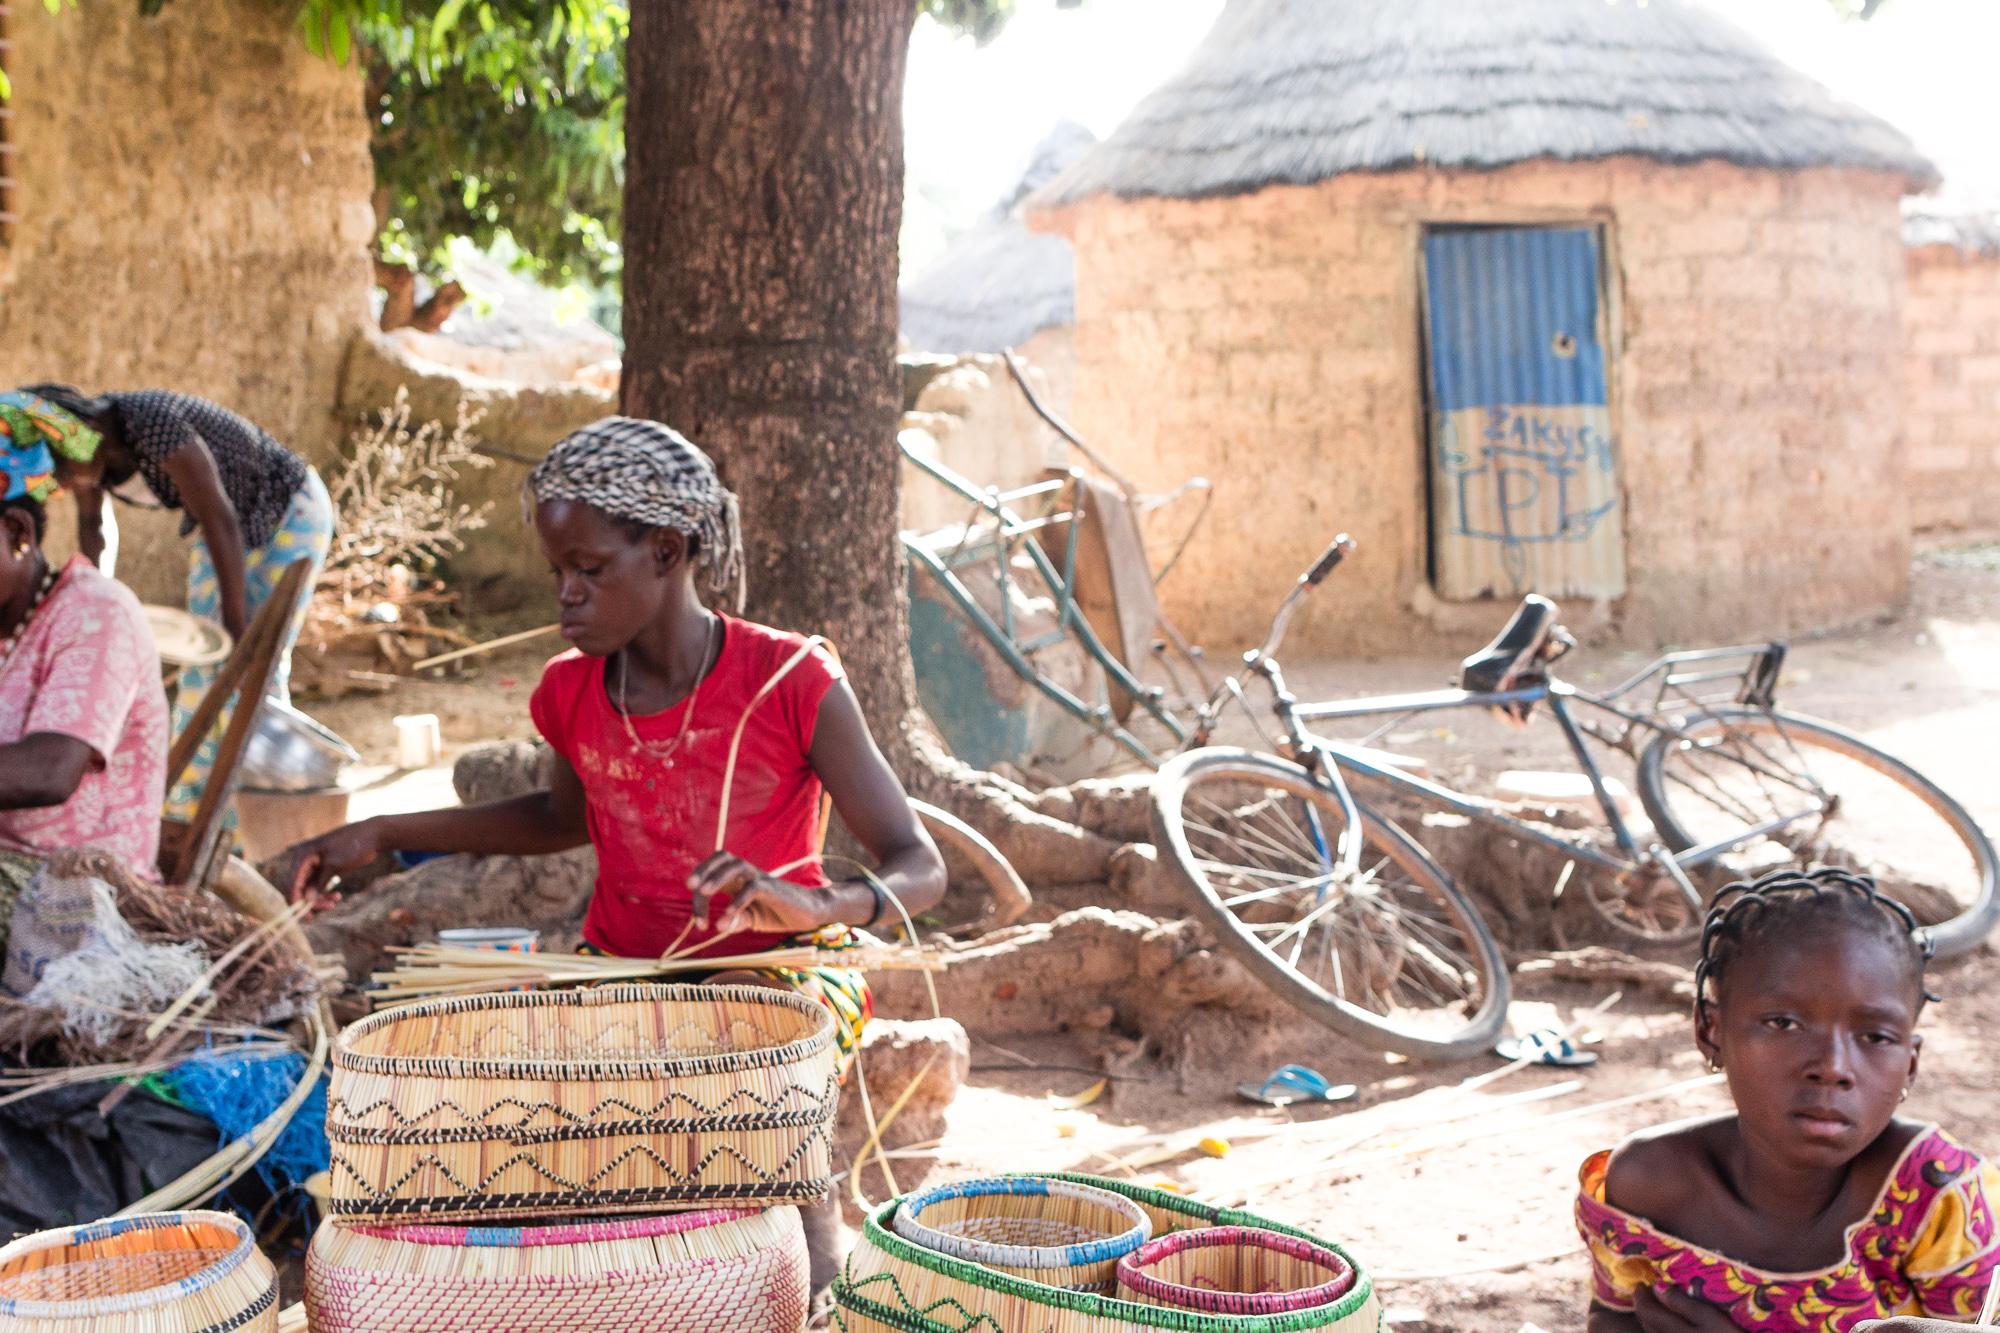 Village Lobi de vannières, artisanat Lobi, Burkina Faso